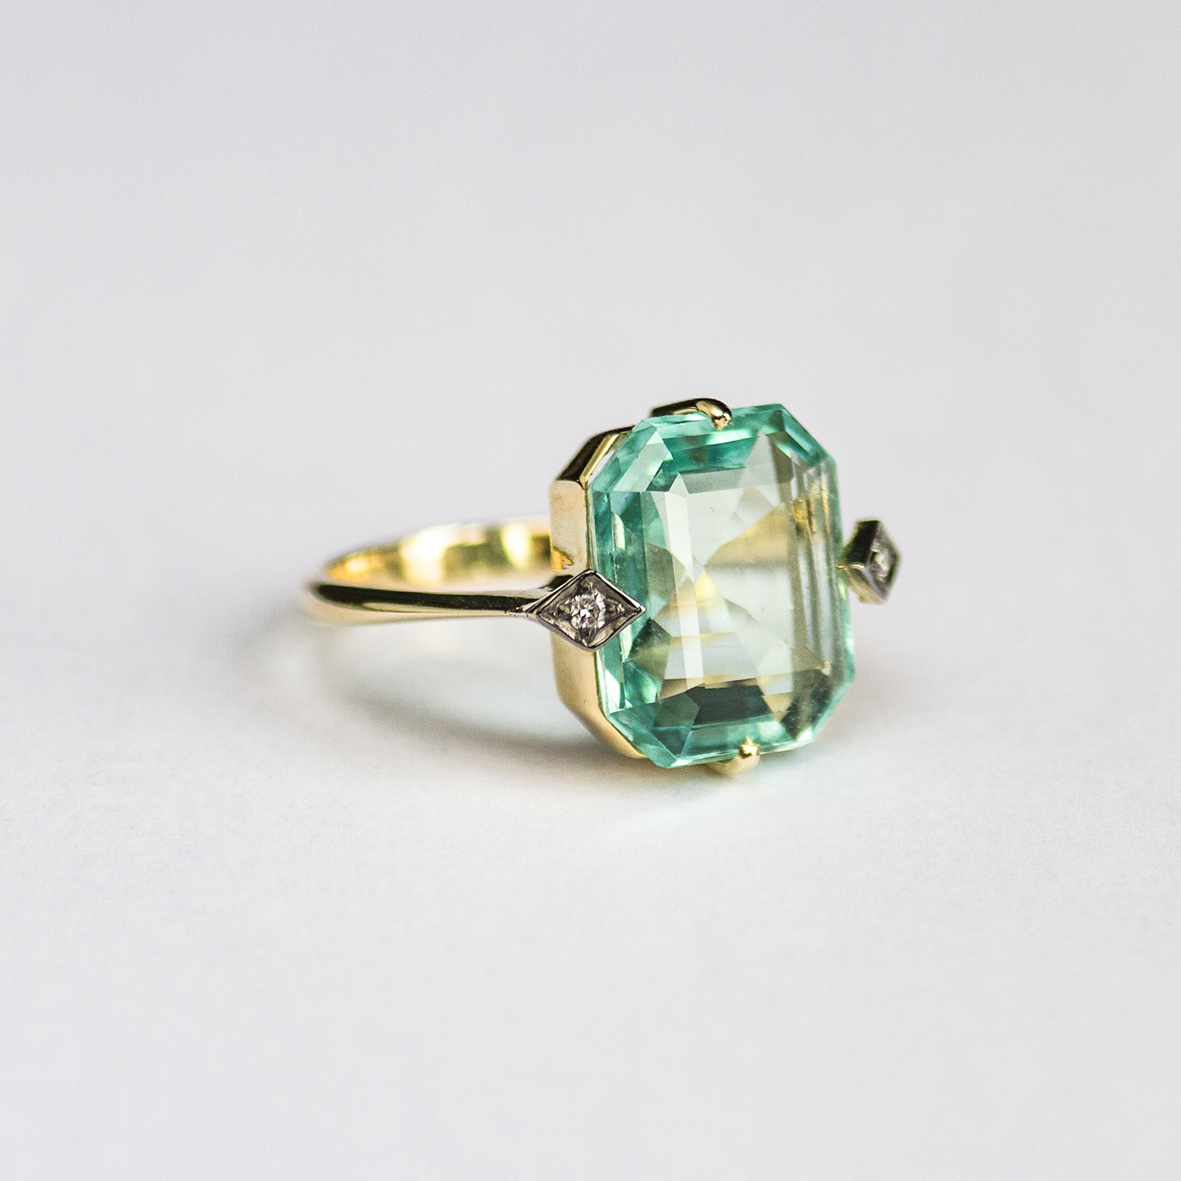 1. OONA_gems of ceylon_principal_green aquamarine ring 1